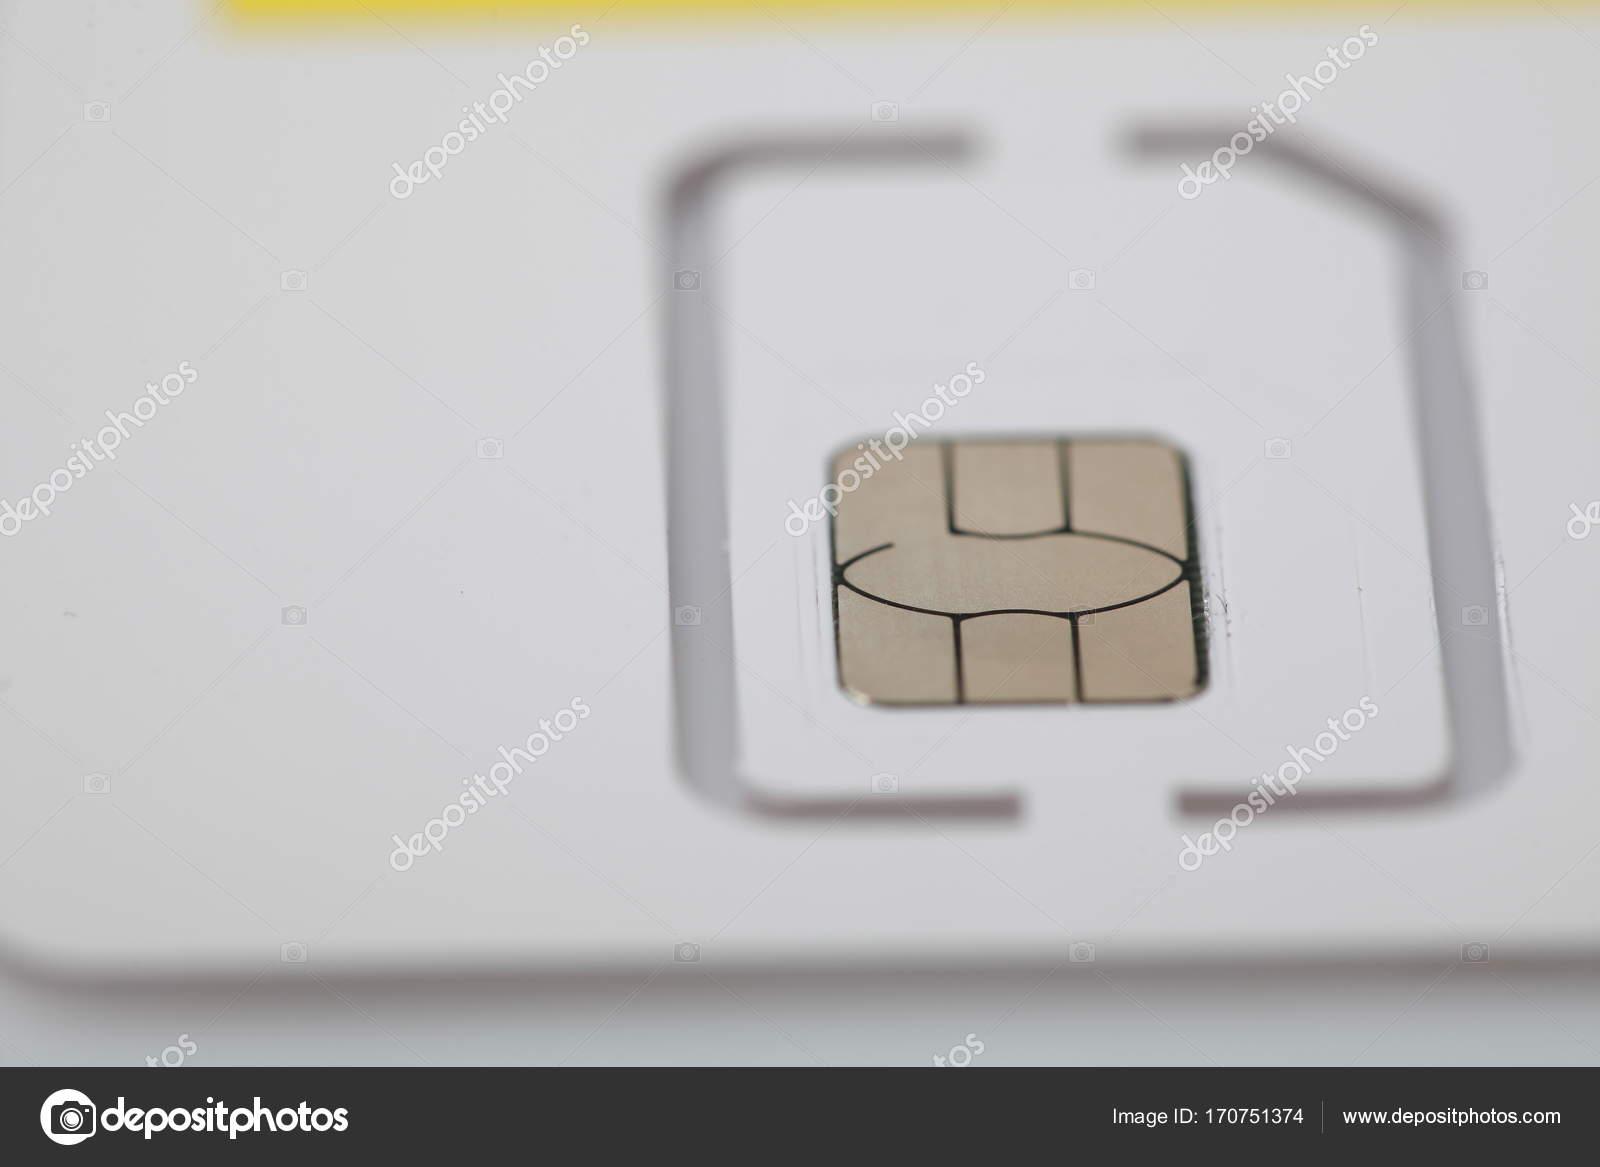 Neue Sim Karte.Neue Sim Karte Format Nano Mikro Und Standard Stockfoto